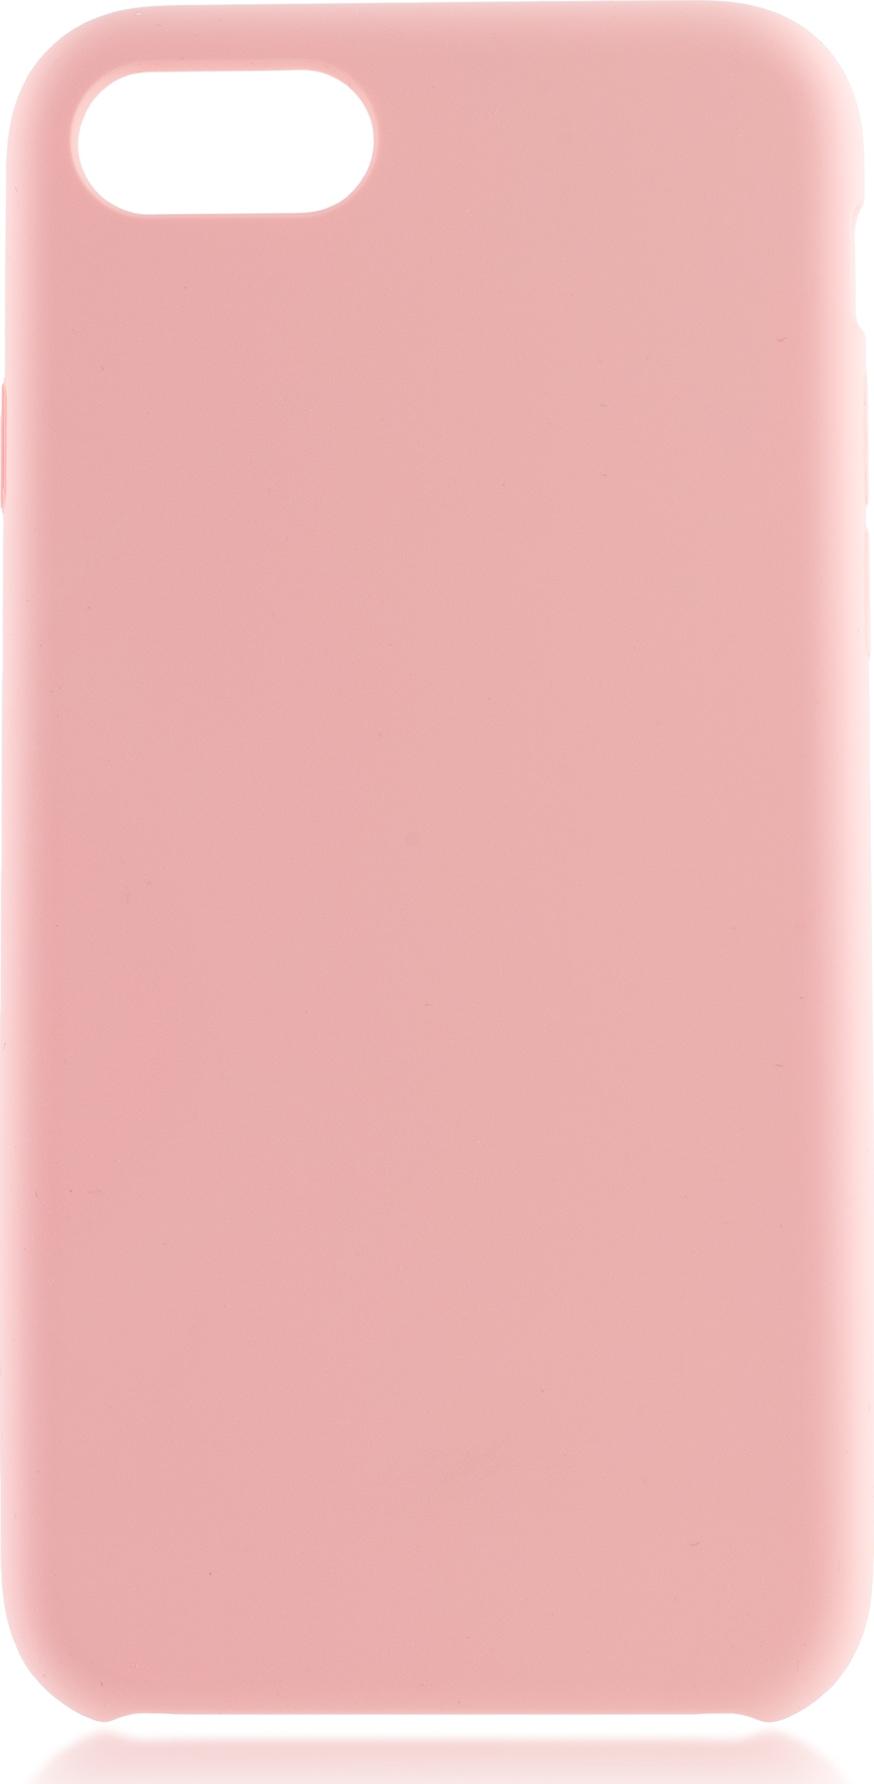 Чехол Brosco Softrubber для Apple iPhone 7, розовый аксессуар чехол для apple iphone 6 brosco soft rubber black ip6 softrubber black